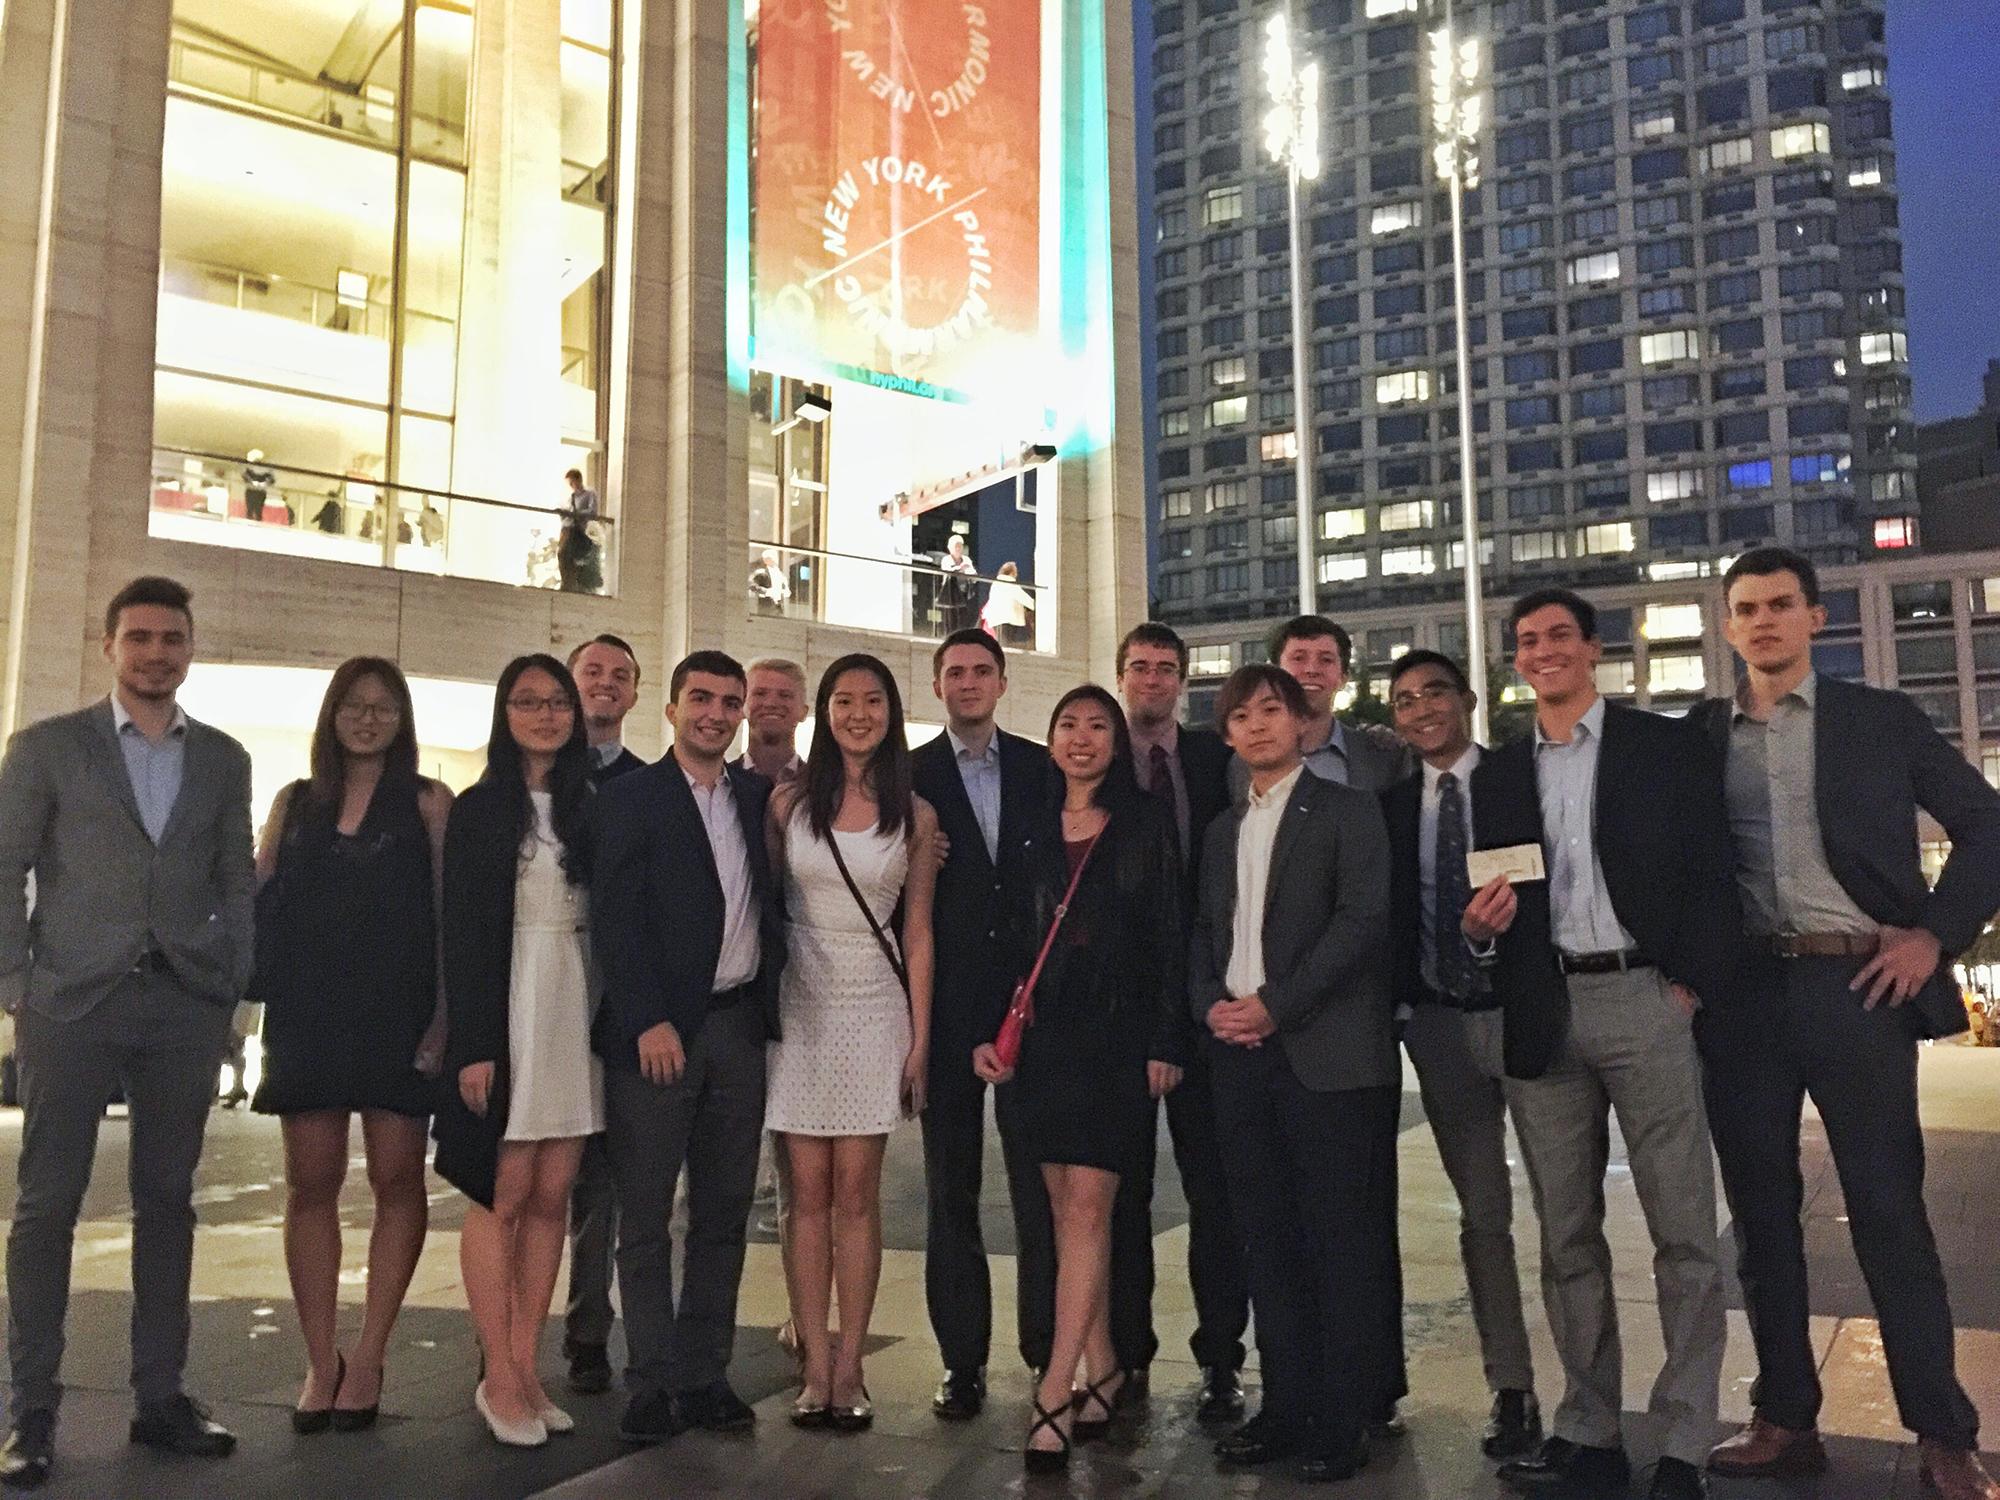 Hamilton's Fall 2015 Program in New York City students at Lincoln Center.